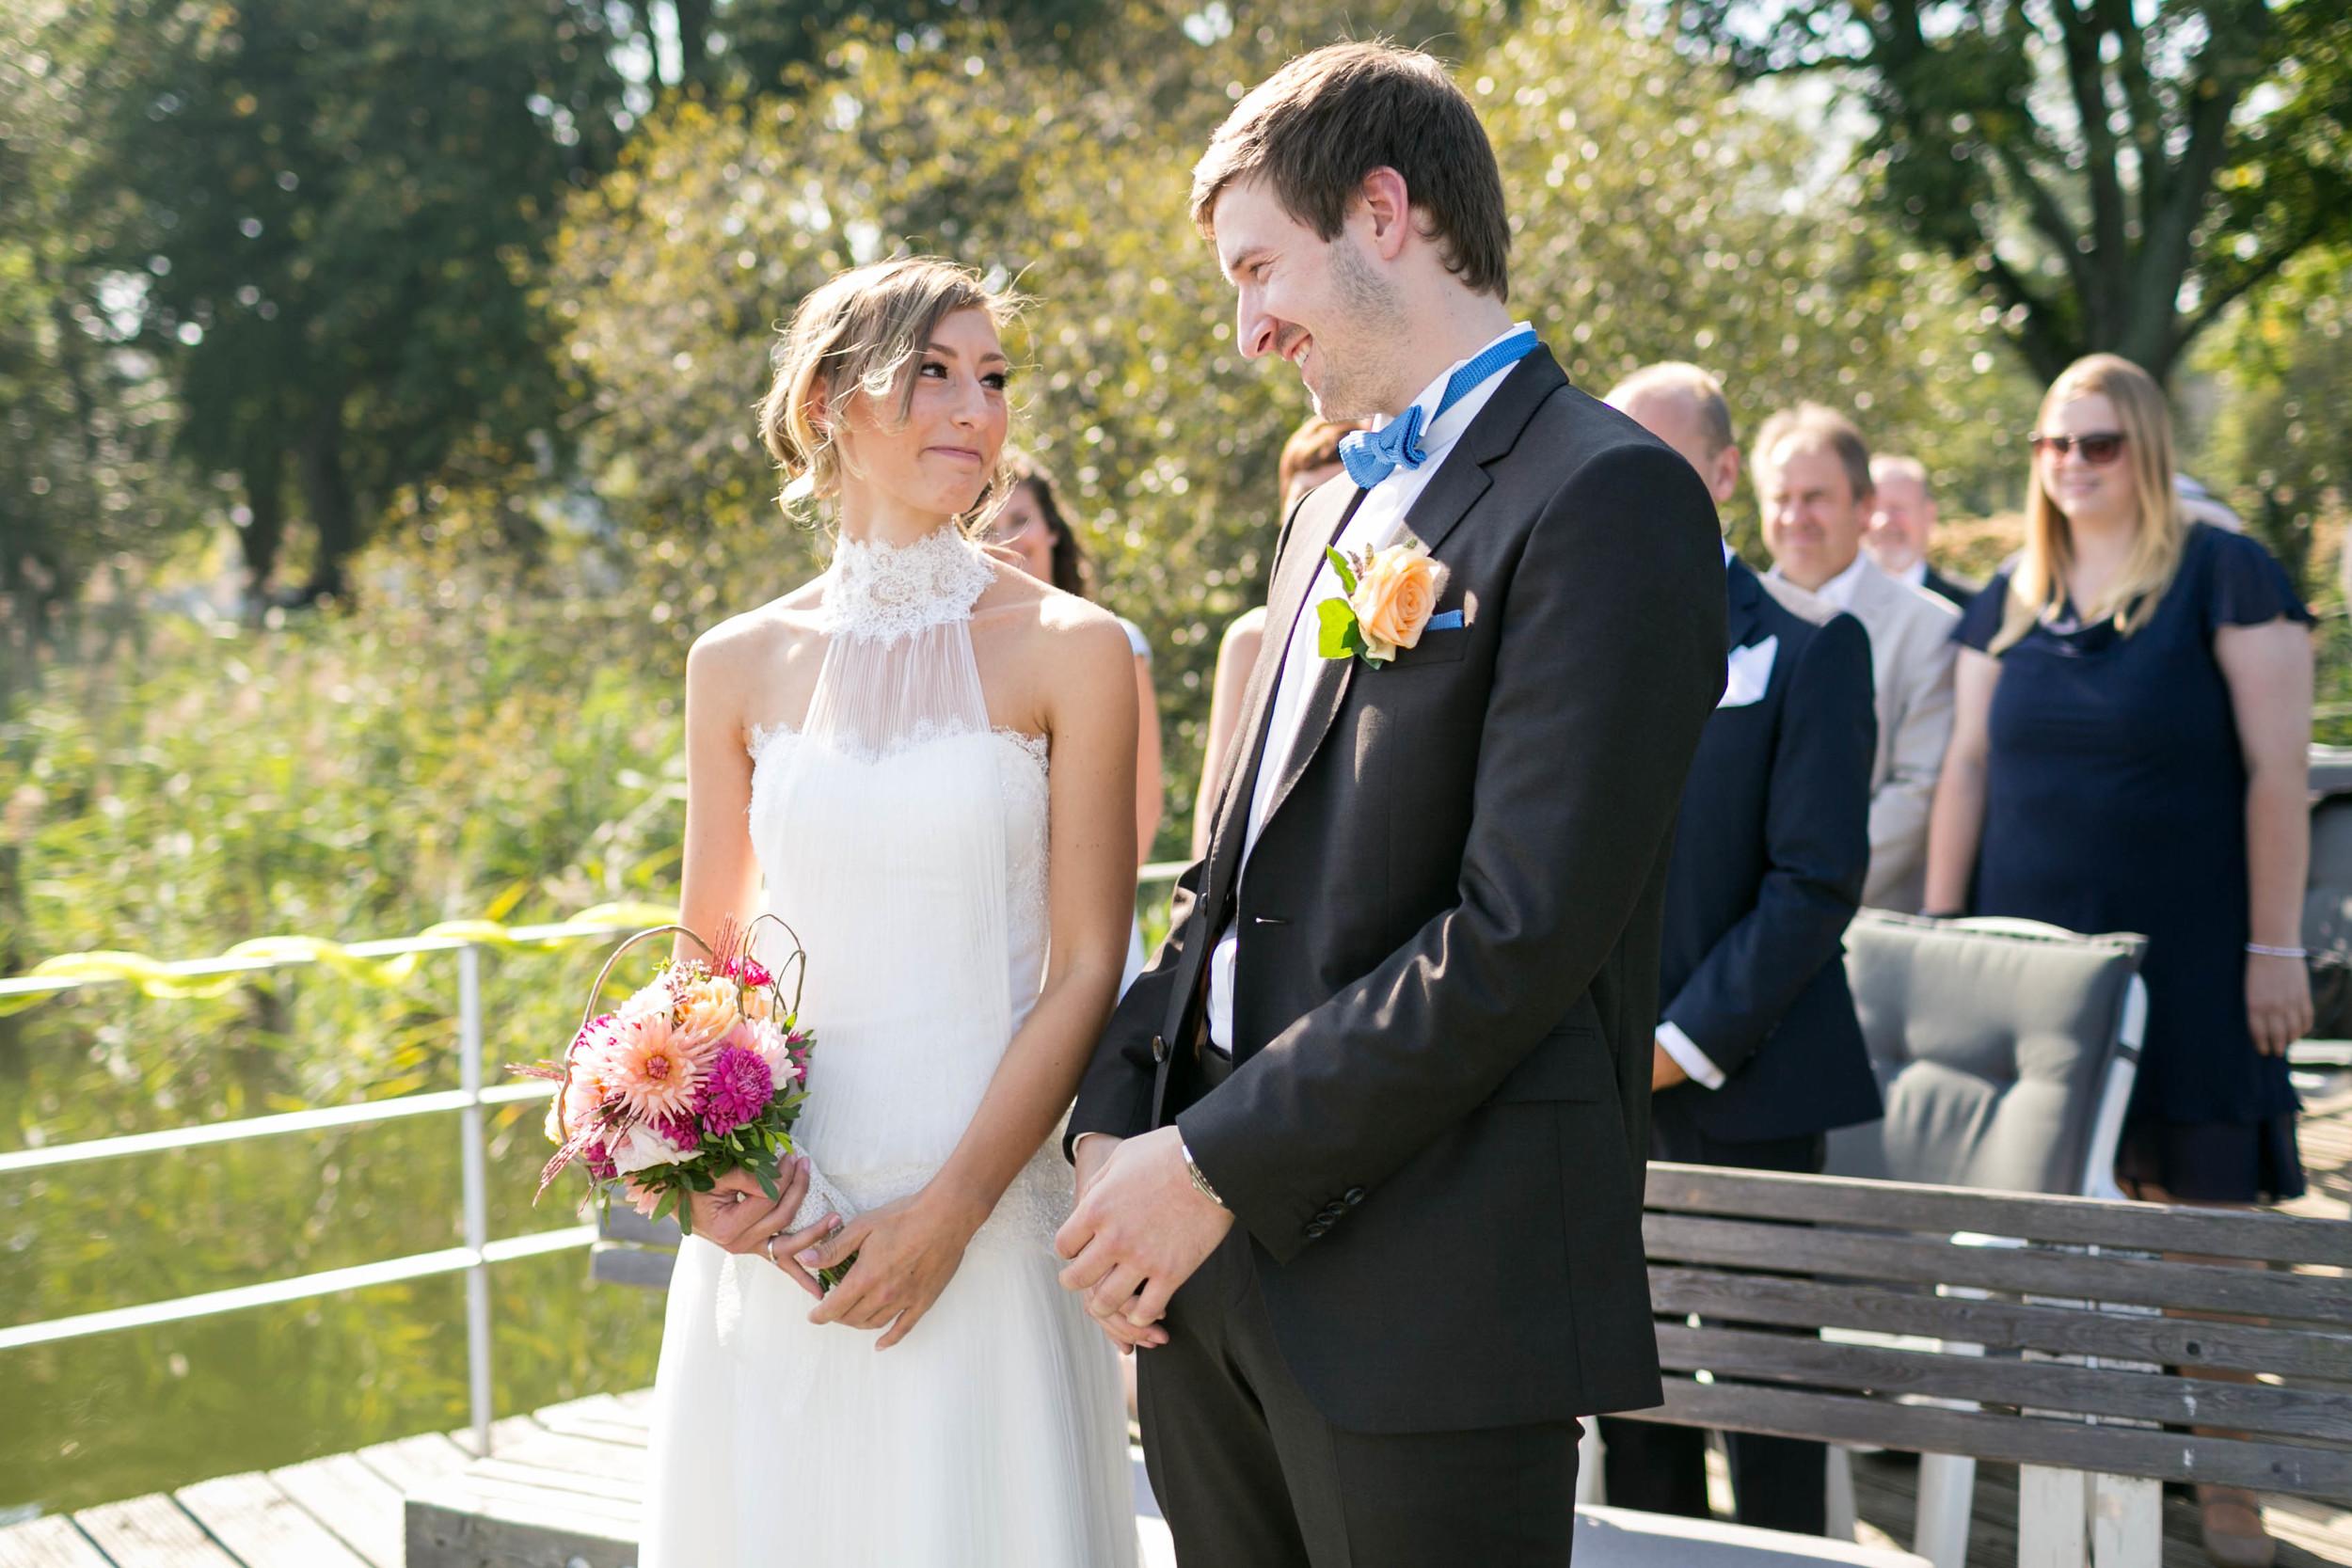 Fran Burrows Hochzeitsfotografie_Kulturgut Wrechen Hochzeit-14.jpg